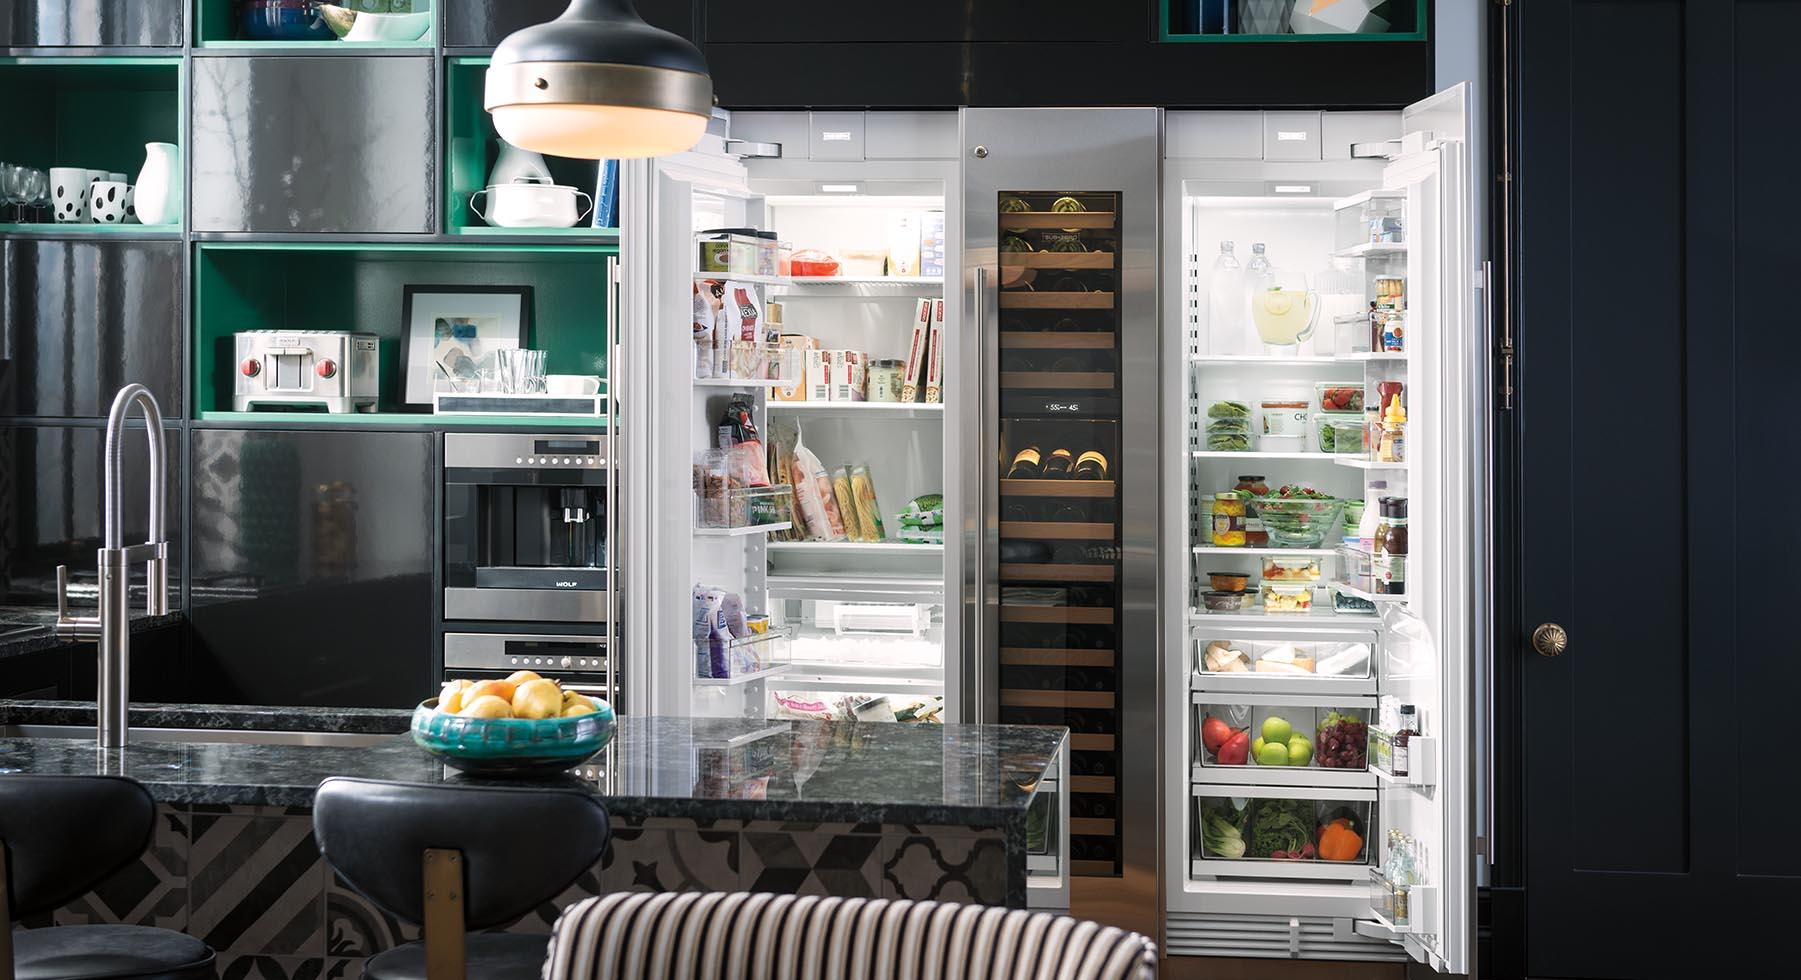 Sub Zero Glass Door Refrigerator subzero overview home appliances, kitchen appliances